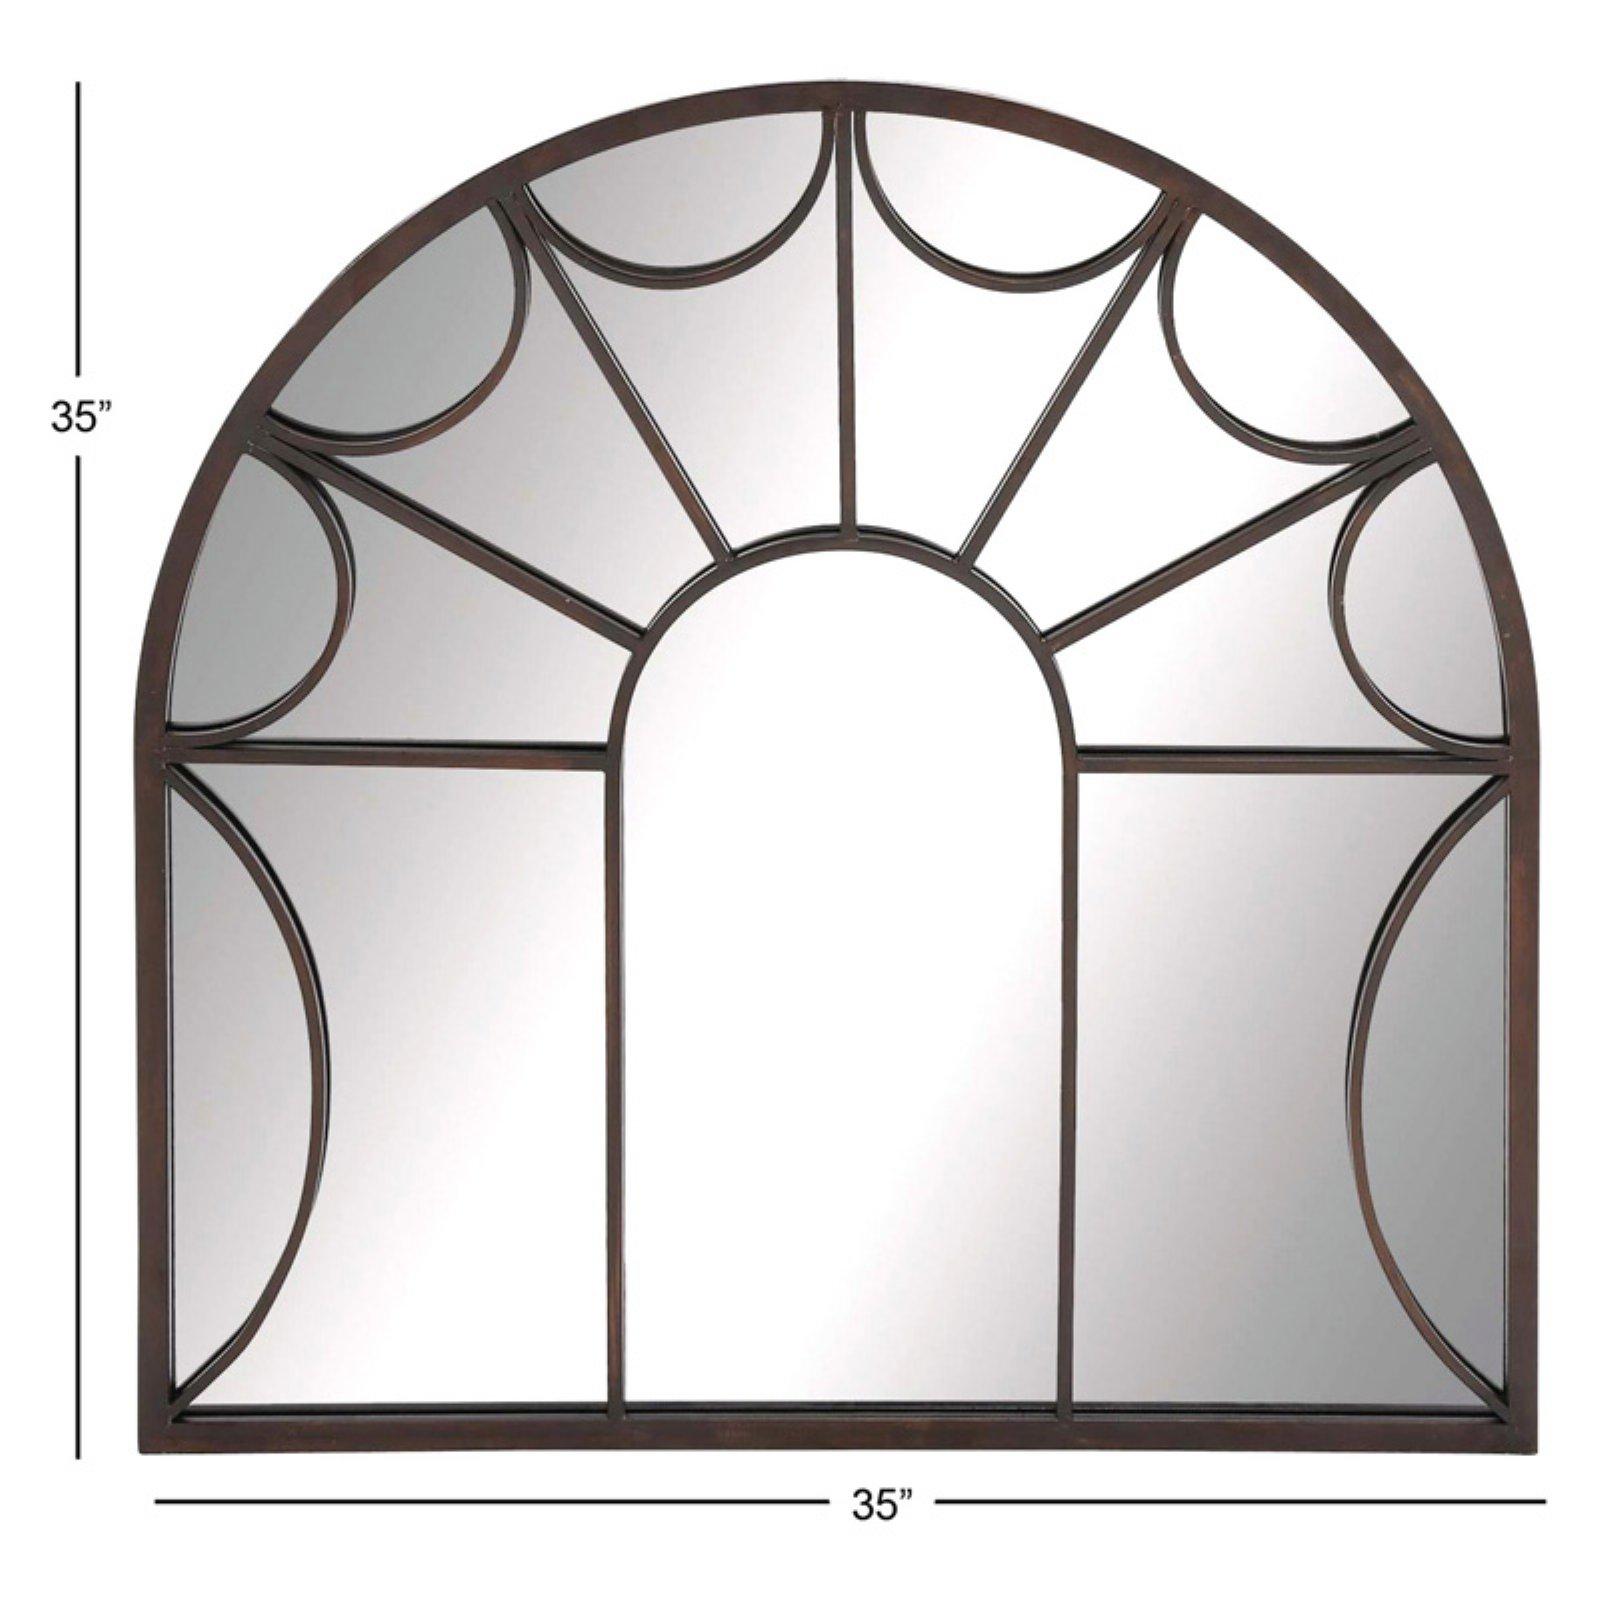 Decmode Metal Wall Mirror, Black Regarding Traditional Metal Wall Mirrors (View 18 of 30)